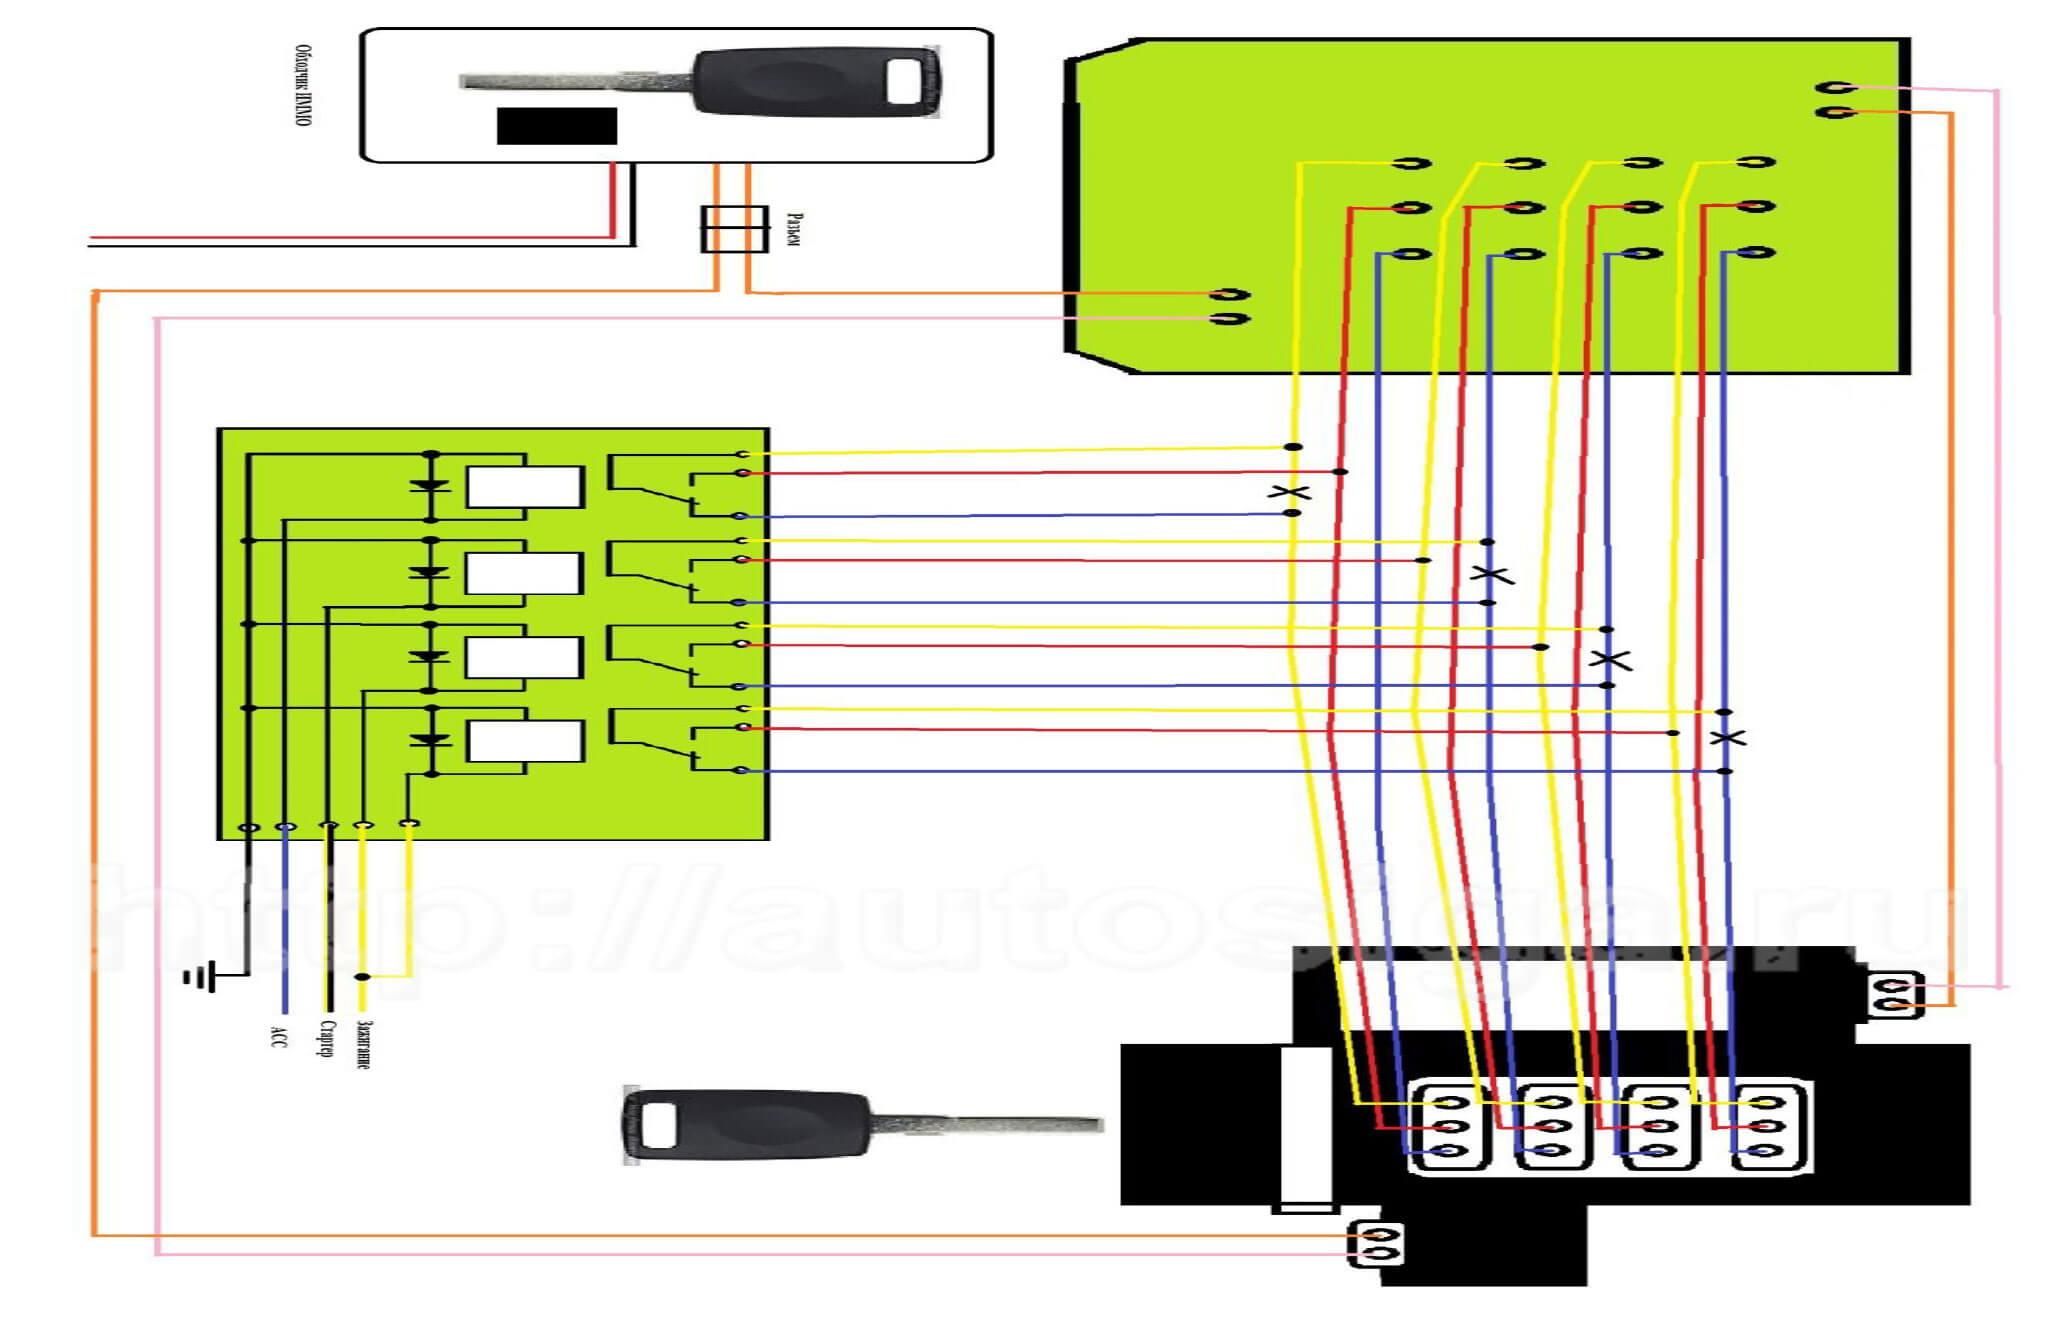 Схема подключения пандора 3910 к can